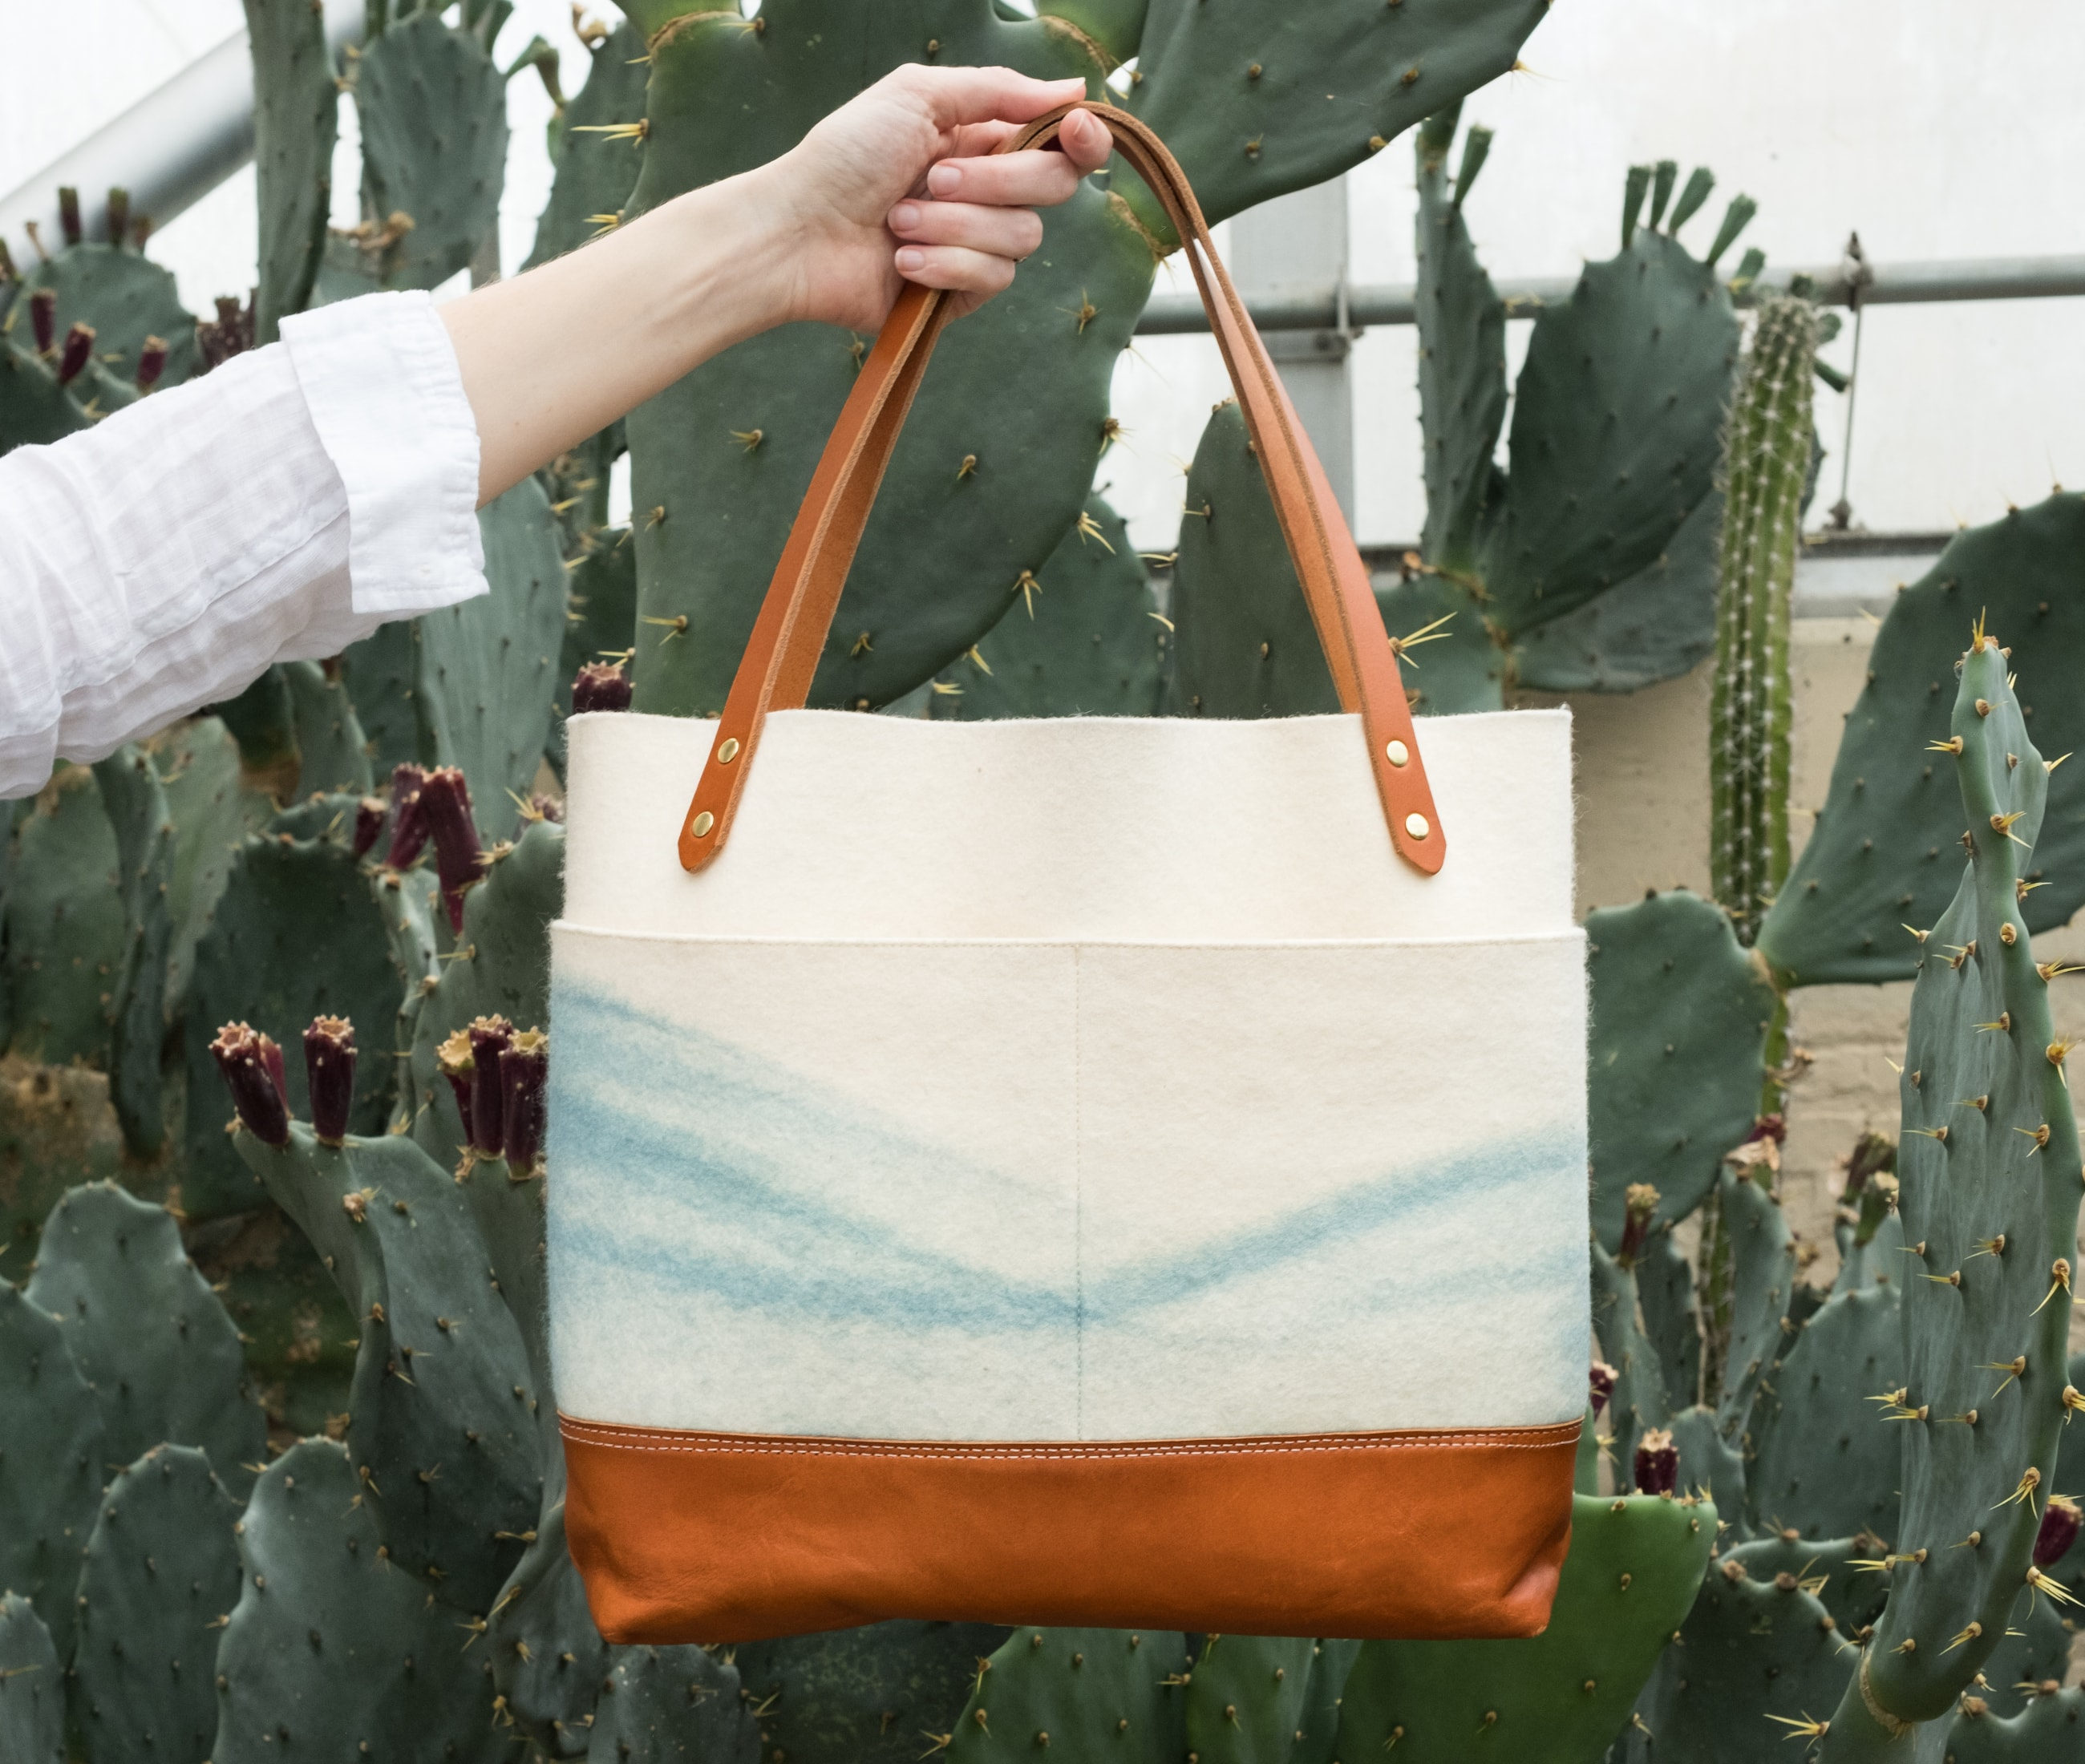 Medium tote felt indigo mountain tan leather lookbook1 by Azellaz